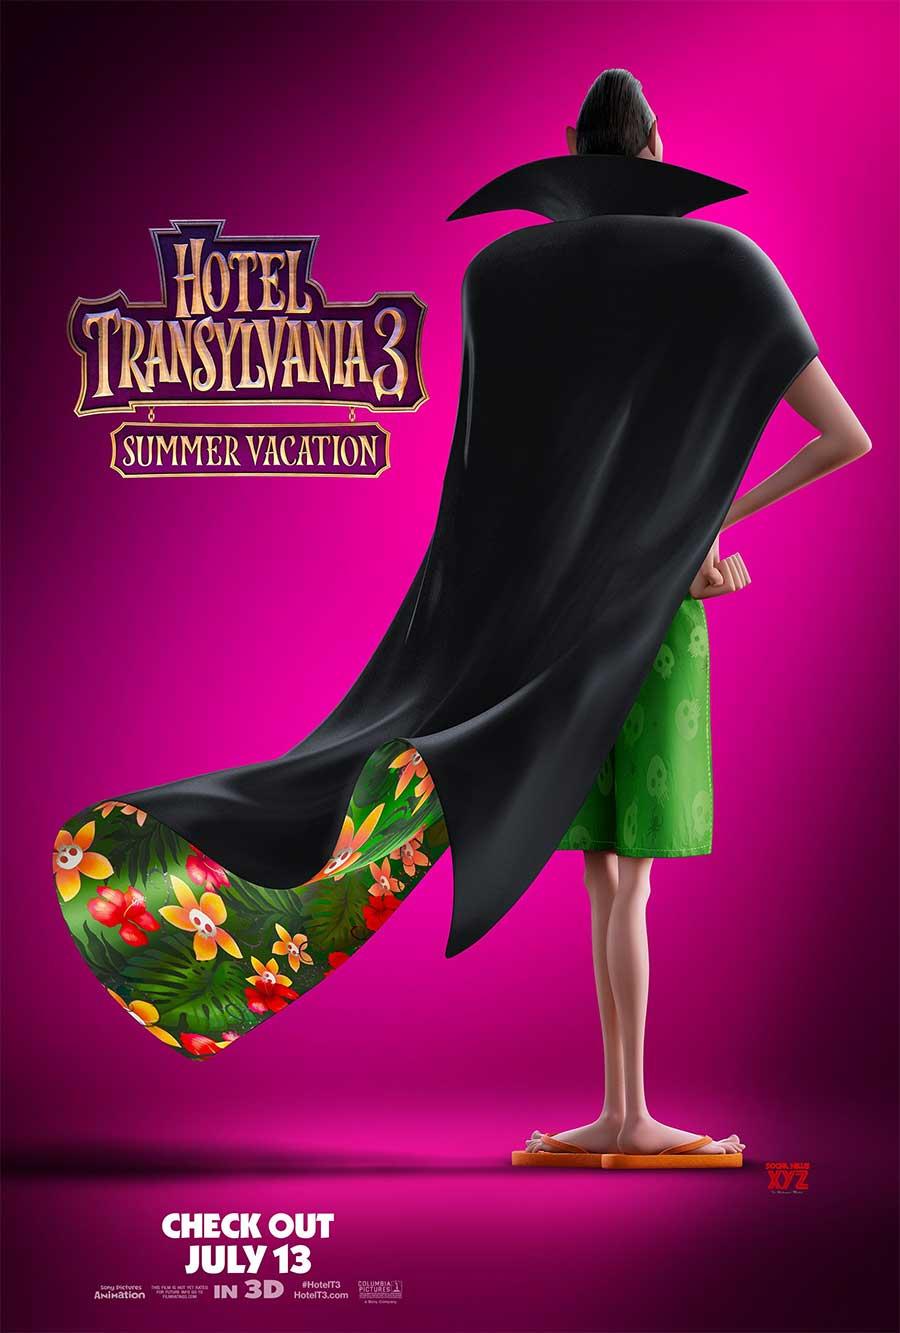 Poster for Hotel Transylvania 3: Summer Vacation